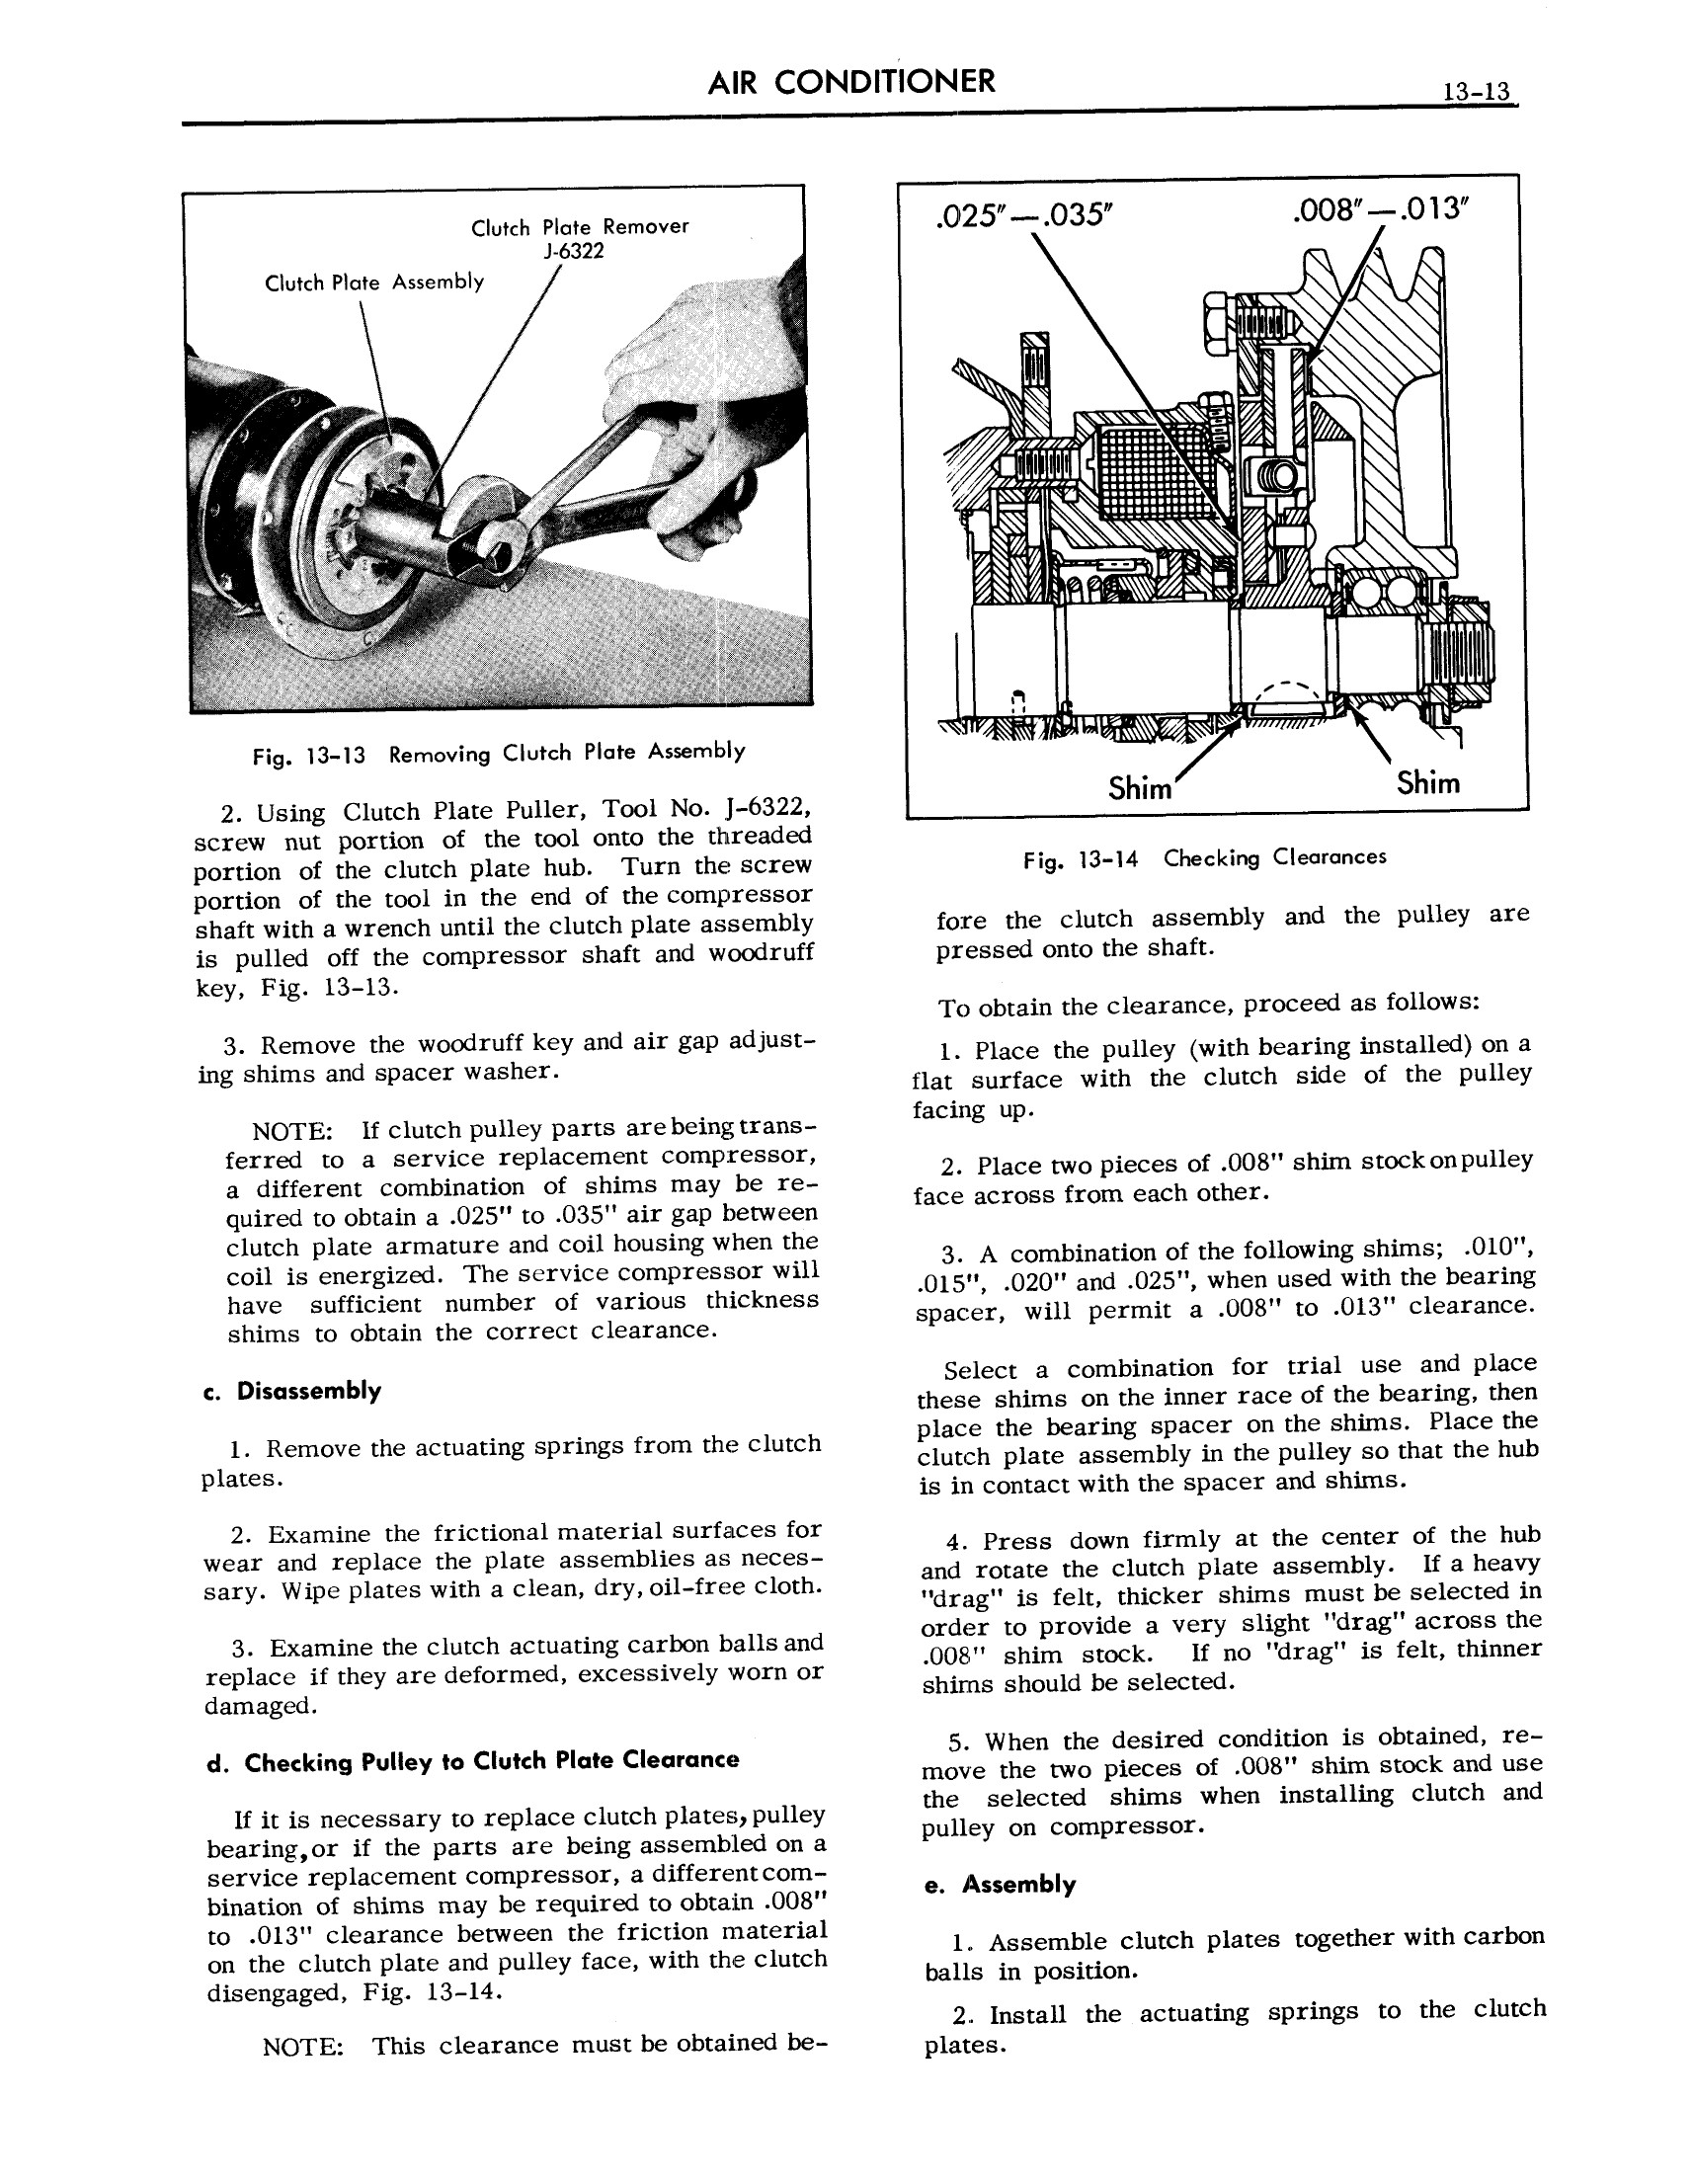 1957 Cadillac Shop Manual- Air Conditioner Page 13 of 22